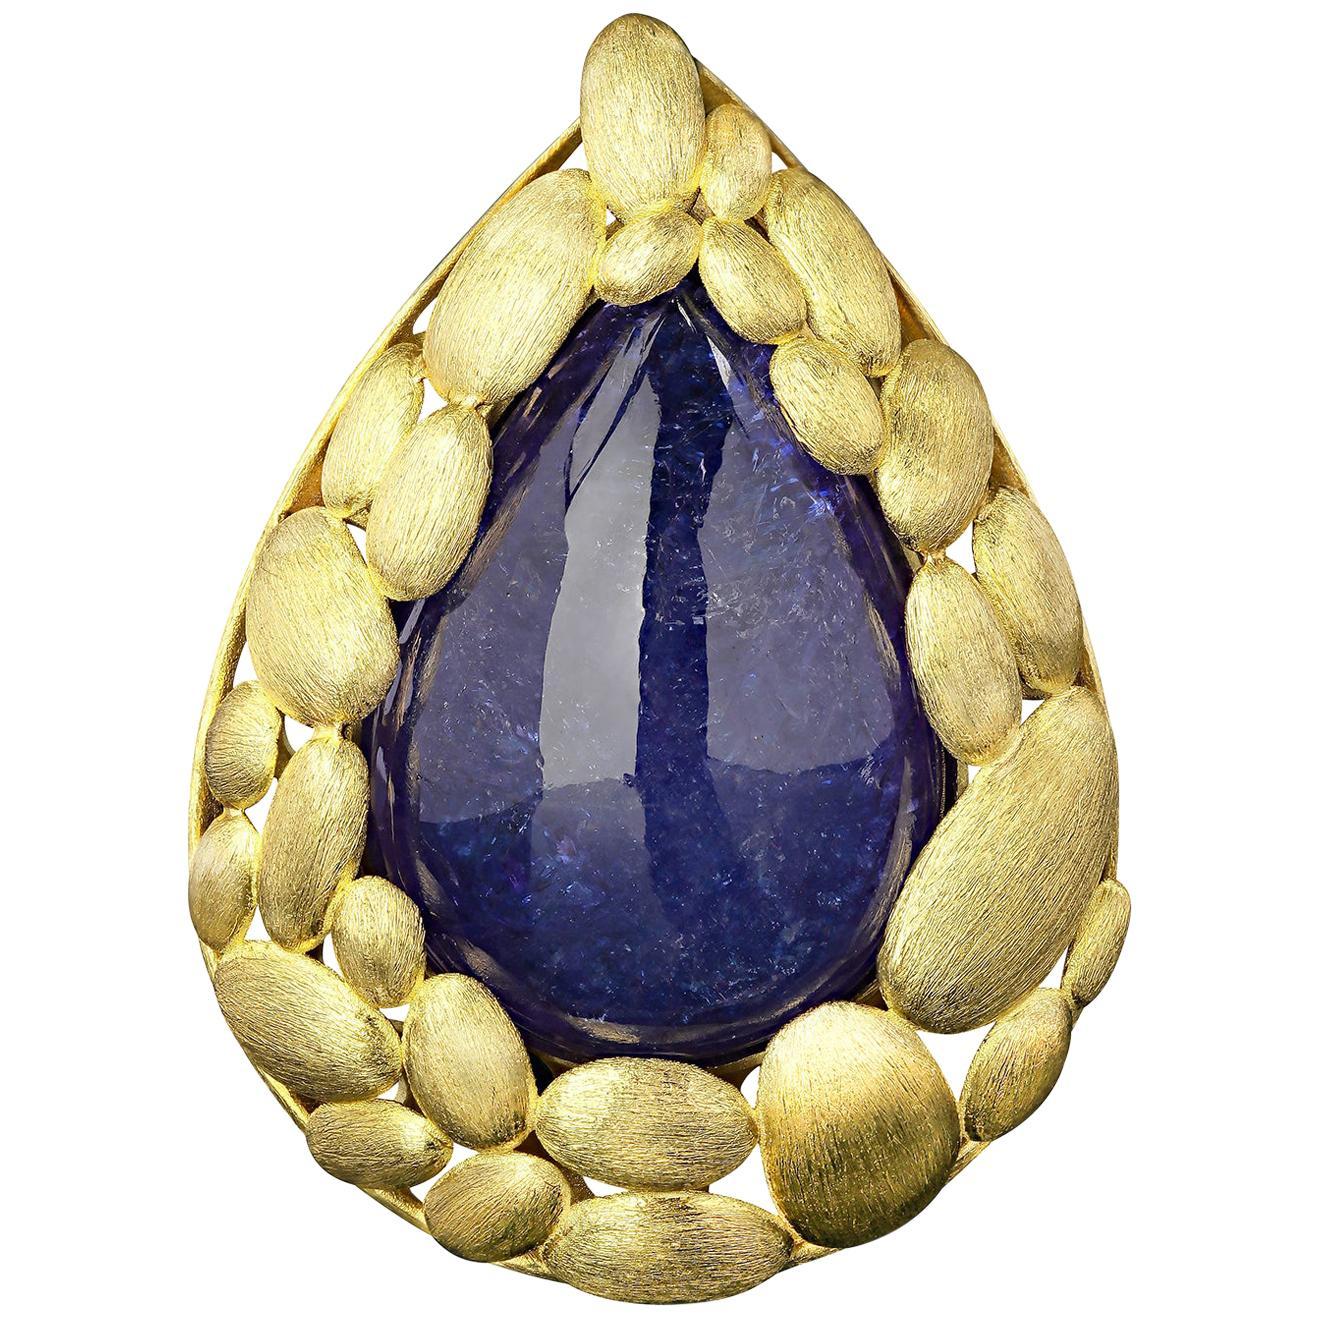 Tanzanite 14k Yellow Gold Pendant Big Unisex Men's Necklace Jewelry Christmas